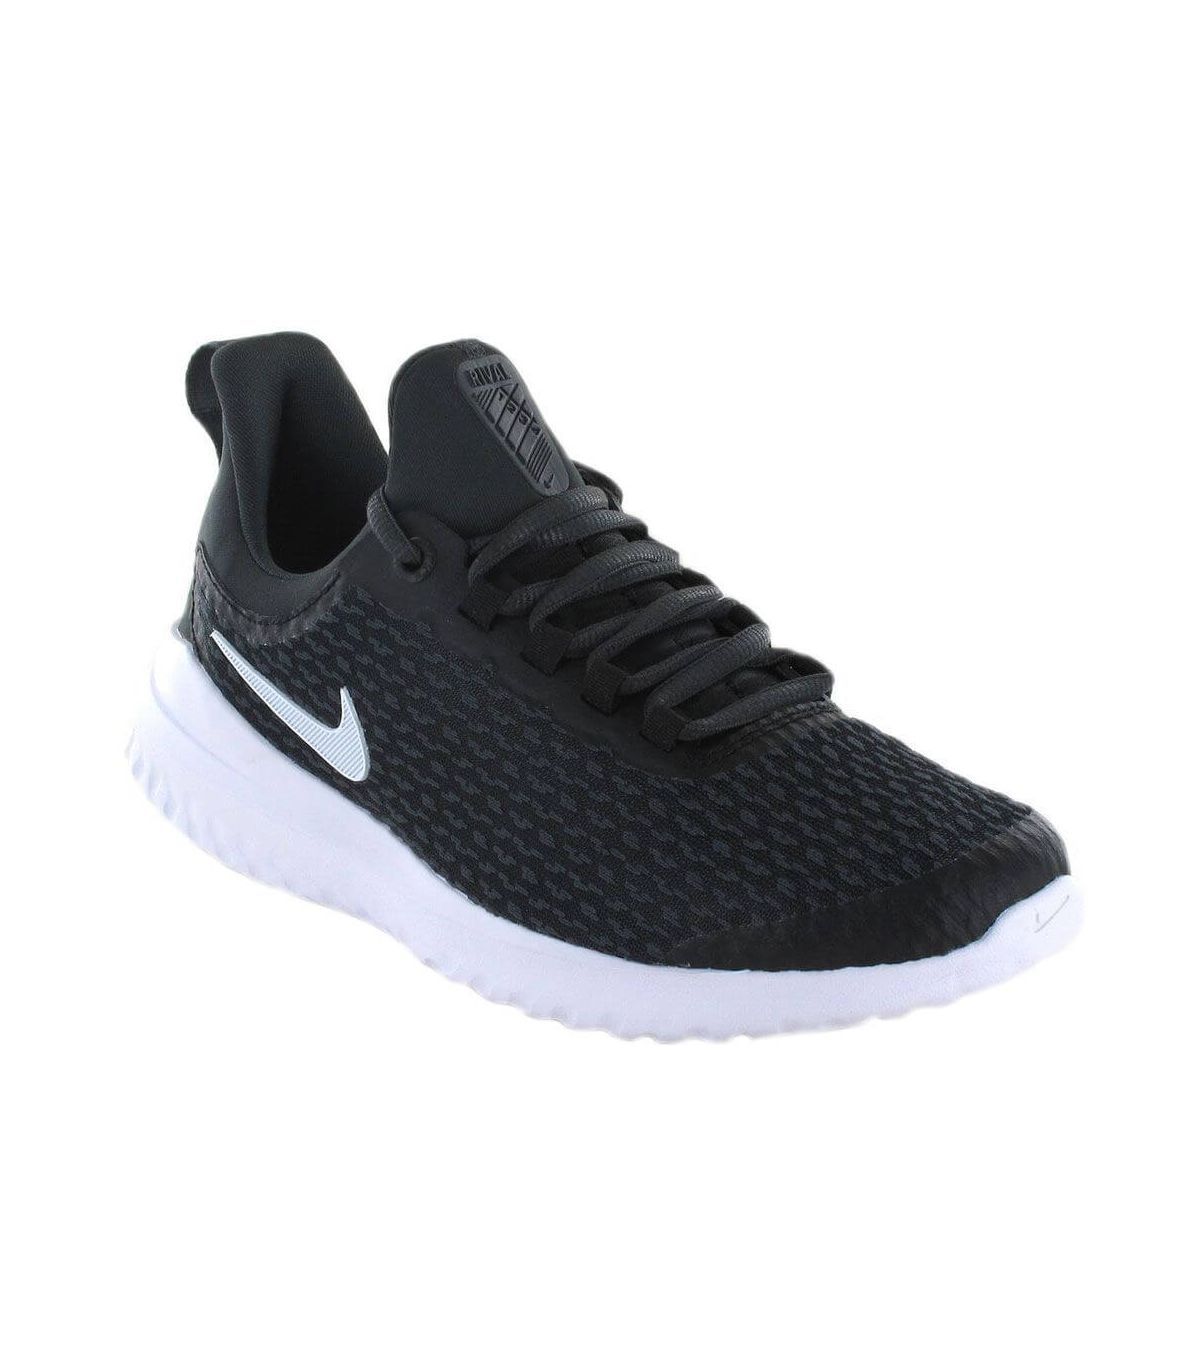 Nike Renew Rival GS Nike Calzado Casual Junior Lifestyle Tallas: 36,5, 37,5, 38, 38,5, 40; Color: negro